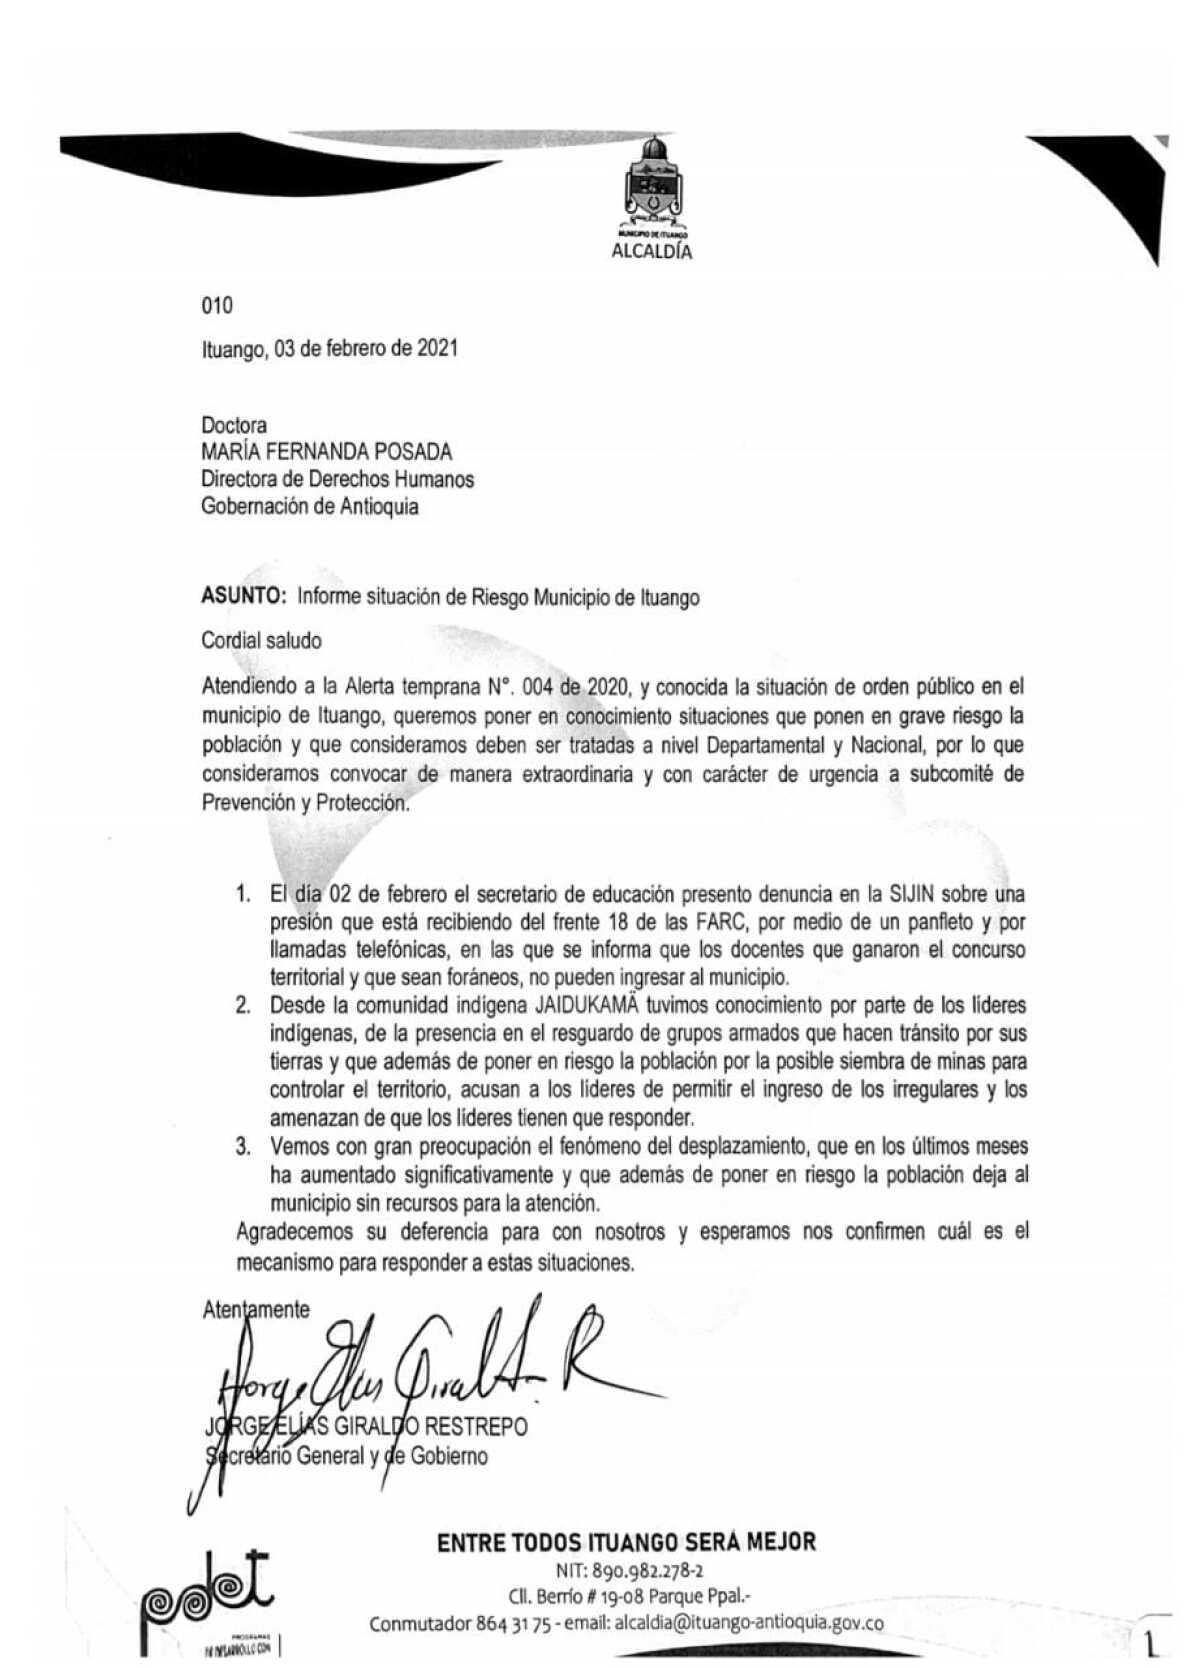 Carta de alcaldía de Ituango, Antioquia